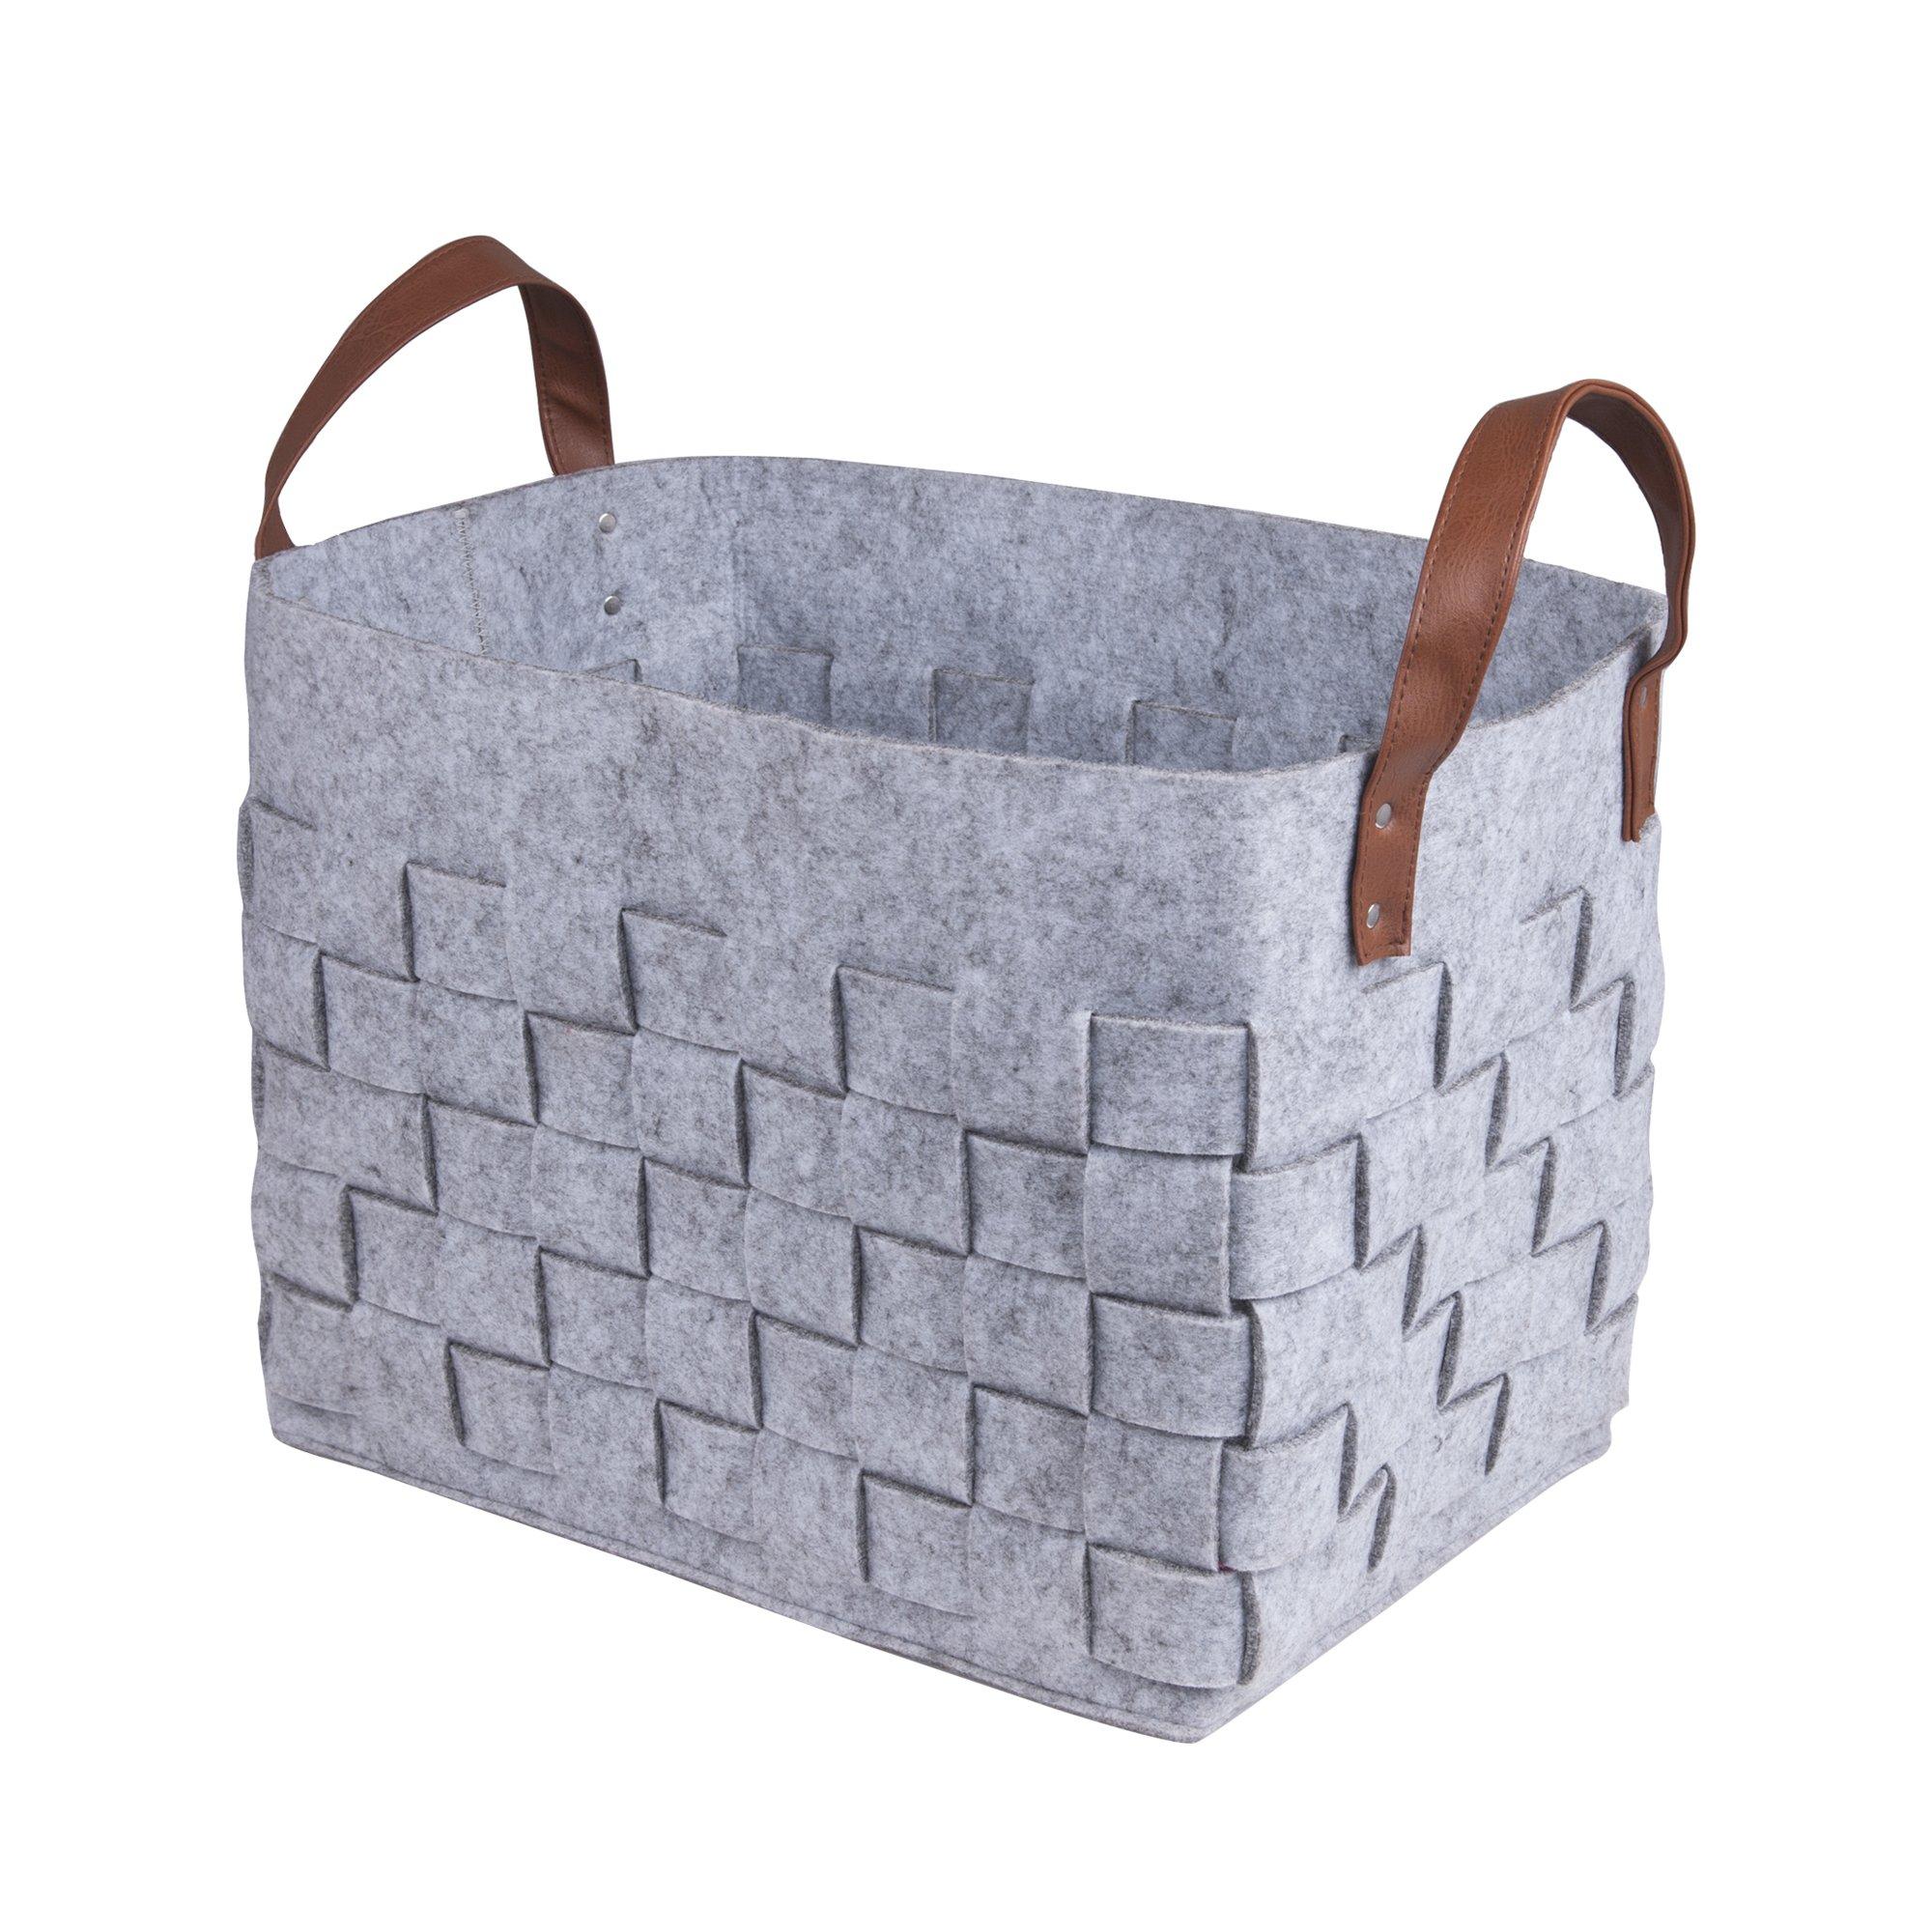 BOLDMONKEY Storage Basket,Laundry Basket, Children's Toy Basket, Dirty Clothes Basket, Brand is Durable, Send Fashion Shopping Bags (Gray)